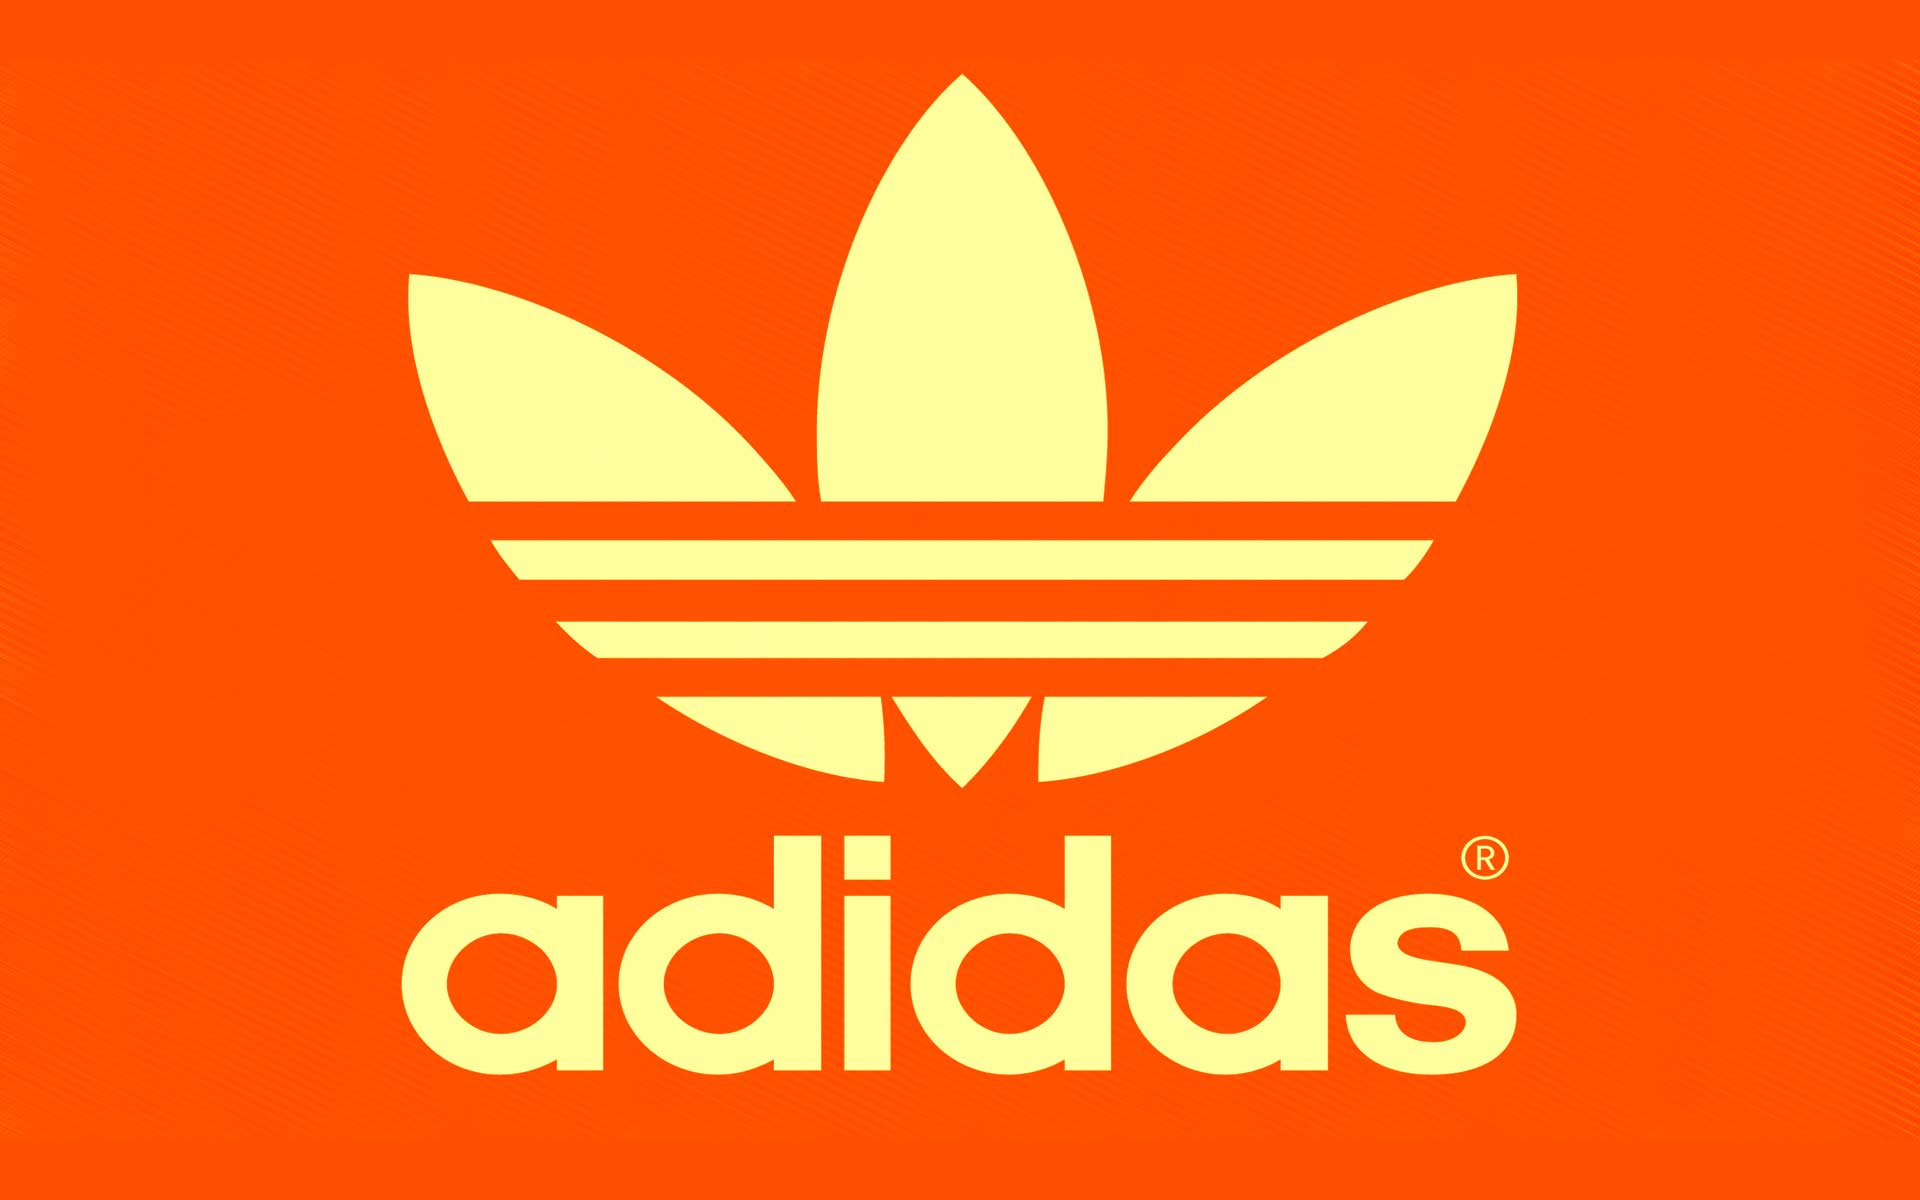 Adidas Logo Wallpapers 1920x1200